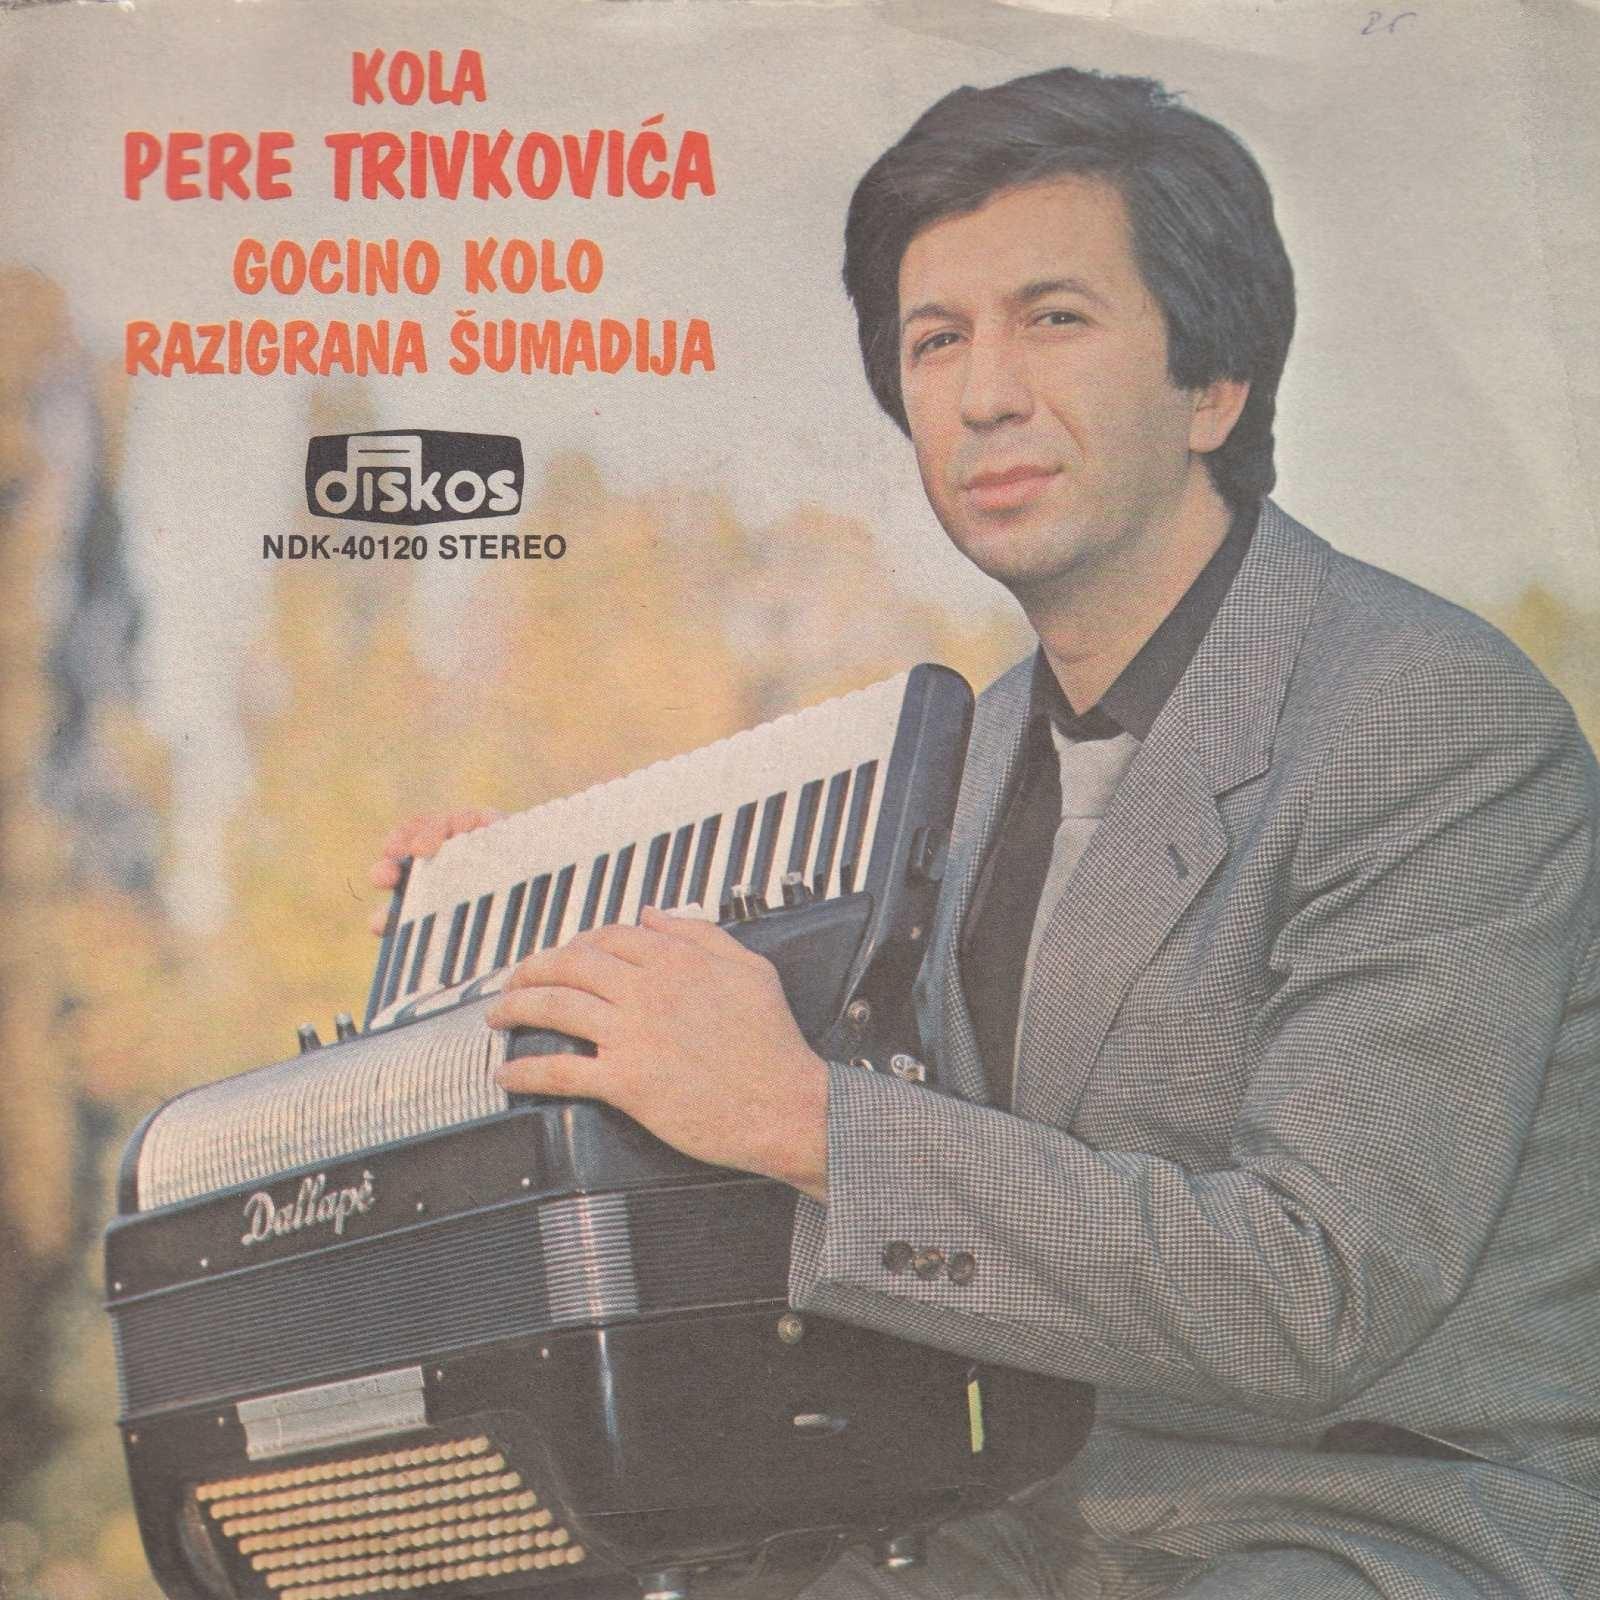 Trivkovic Pero - Kola - Gocino Kolo/razigrana Sumadija